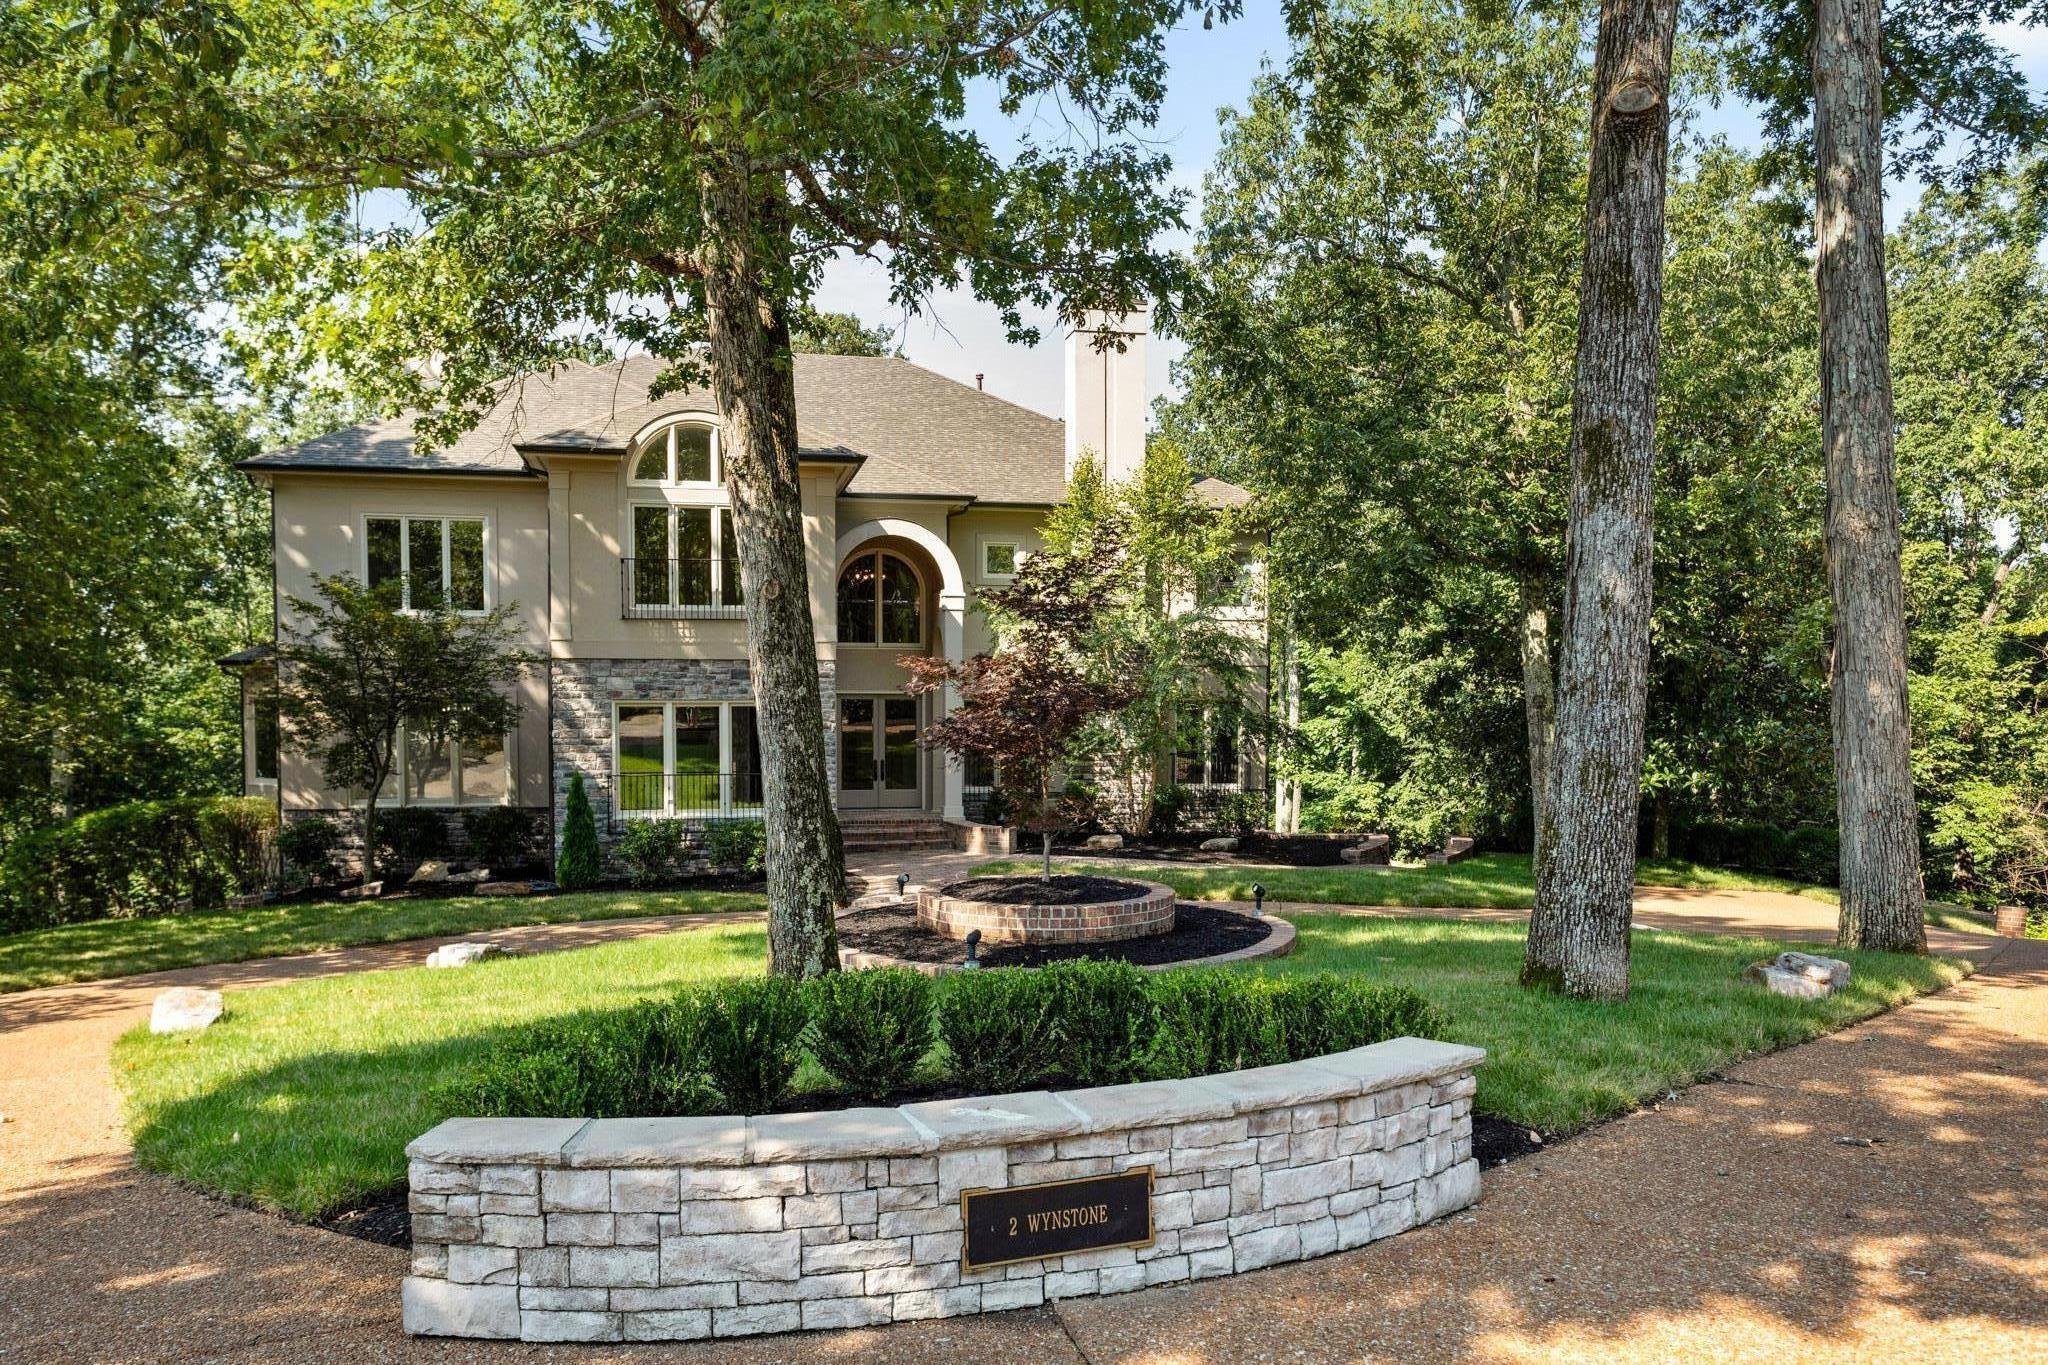 2 Wynstone, Nashville, TN 37215 - Nashville, TN real estate listing